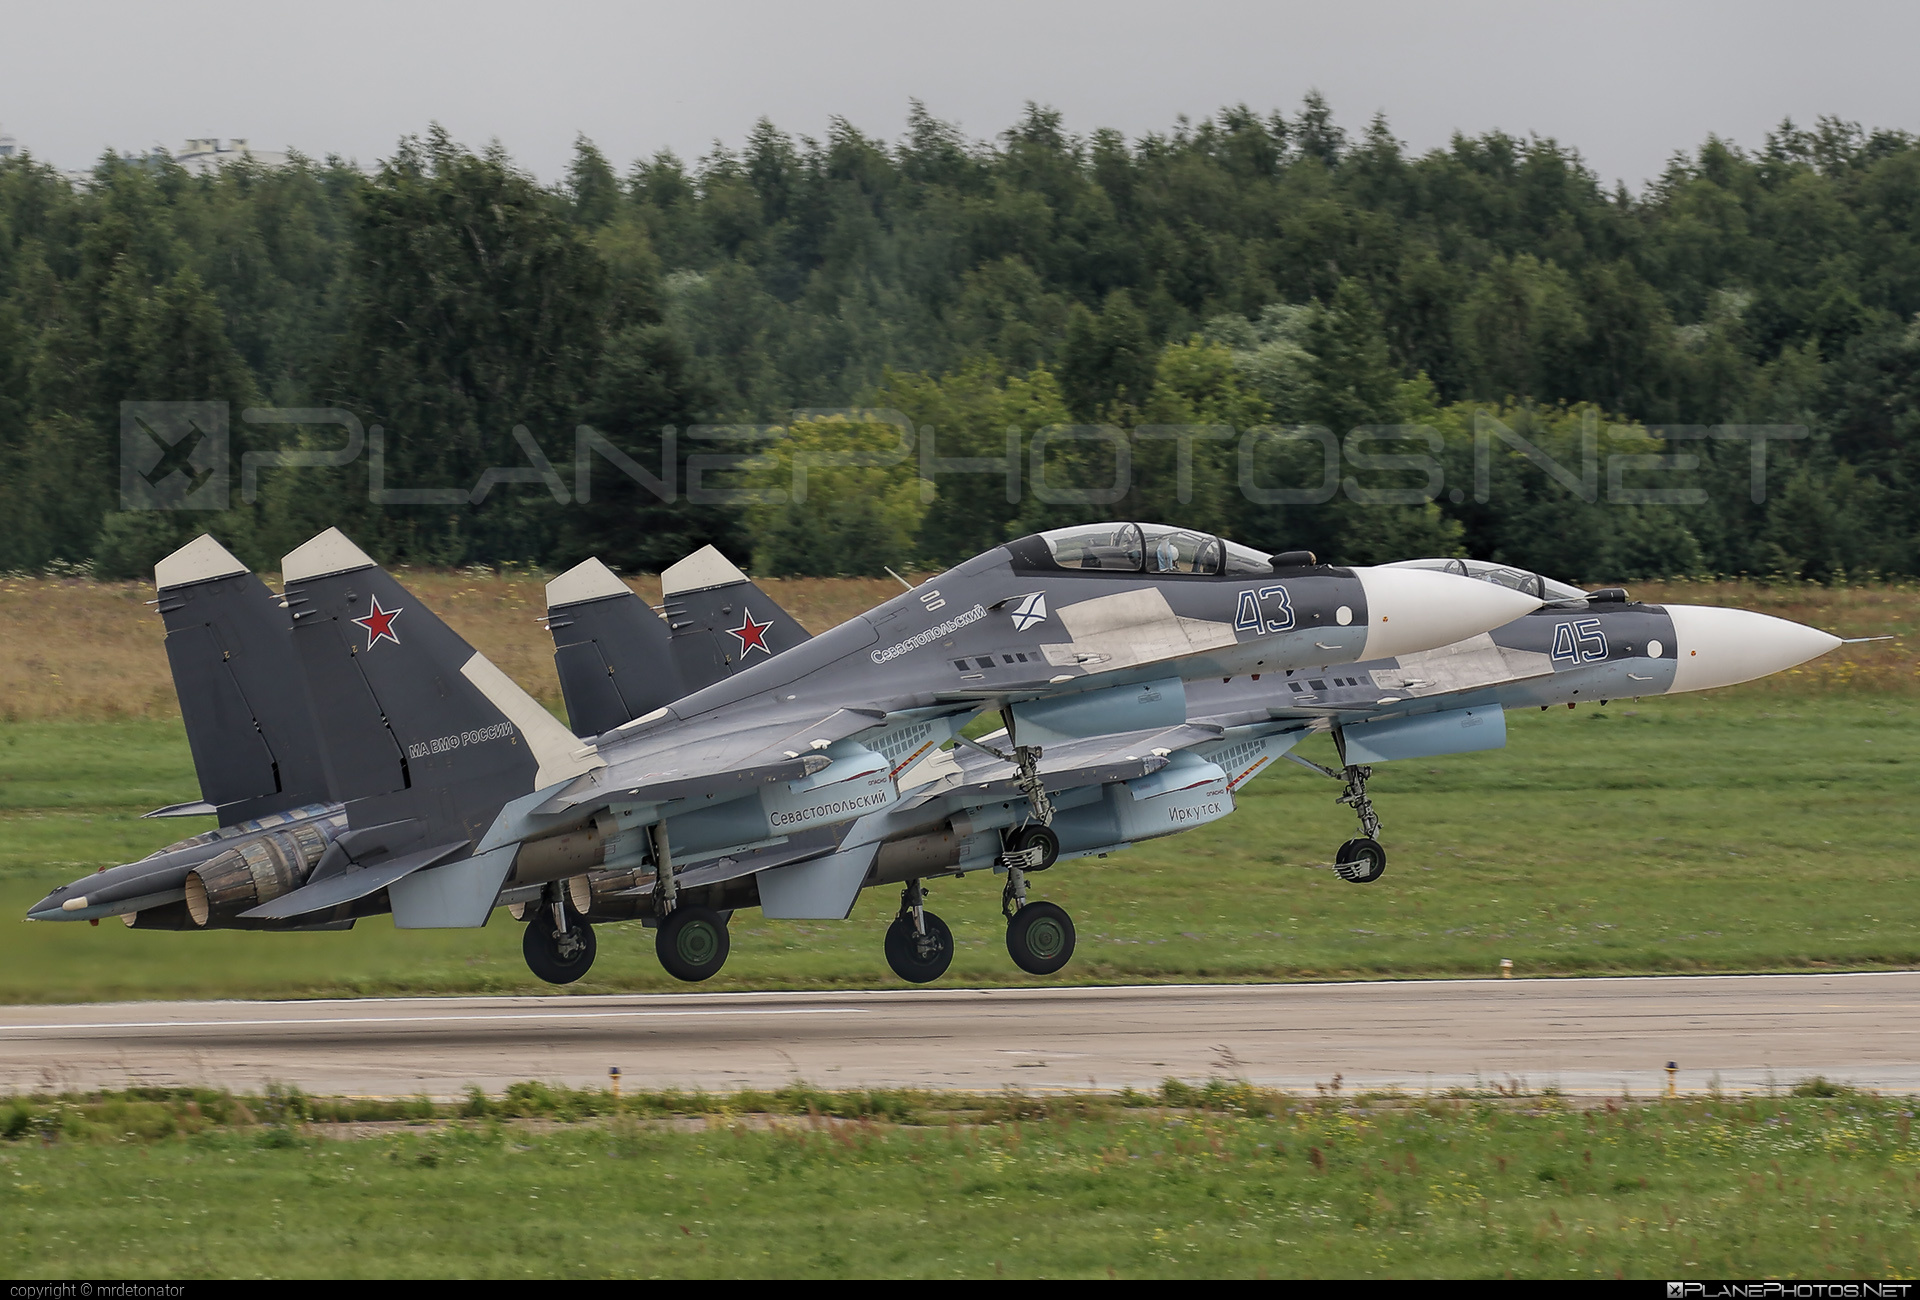 Sukhoi Su-30SM - 43 operated by Voyenno-morskoy flot Rossii (Russian Navy) #maks2017 #su30 #su30sm #sukhoi #sukhoi30 #sukhoisu30sm